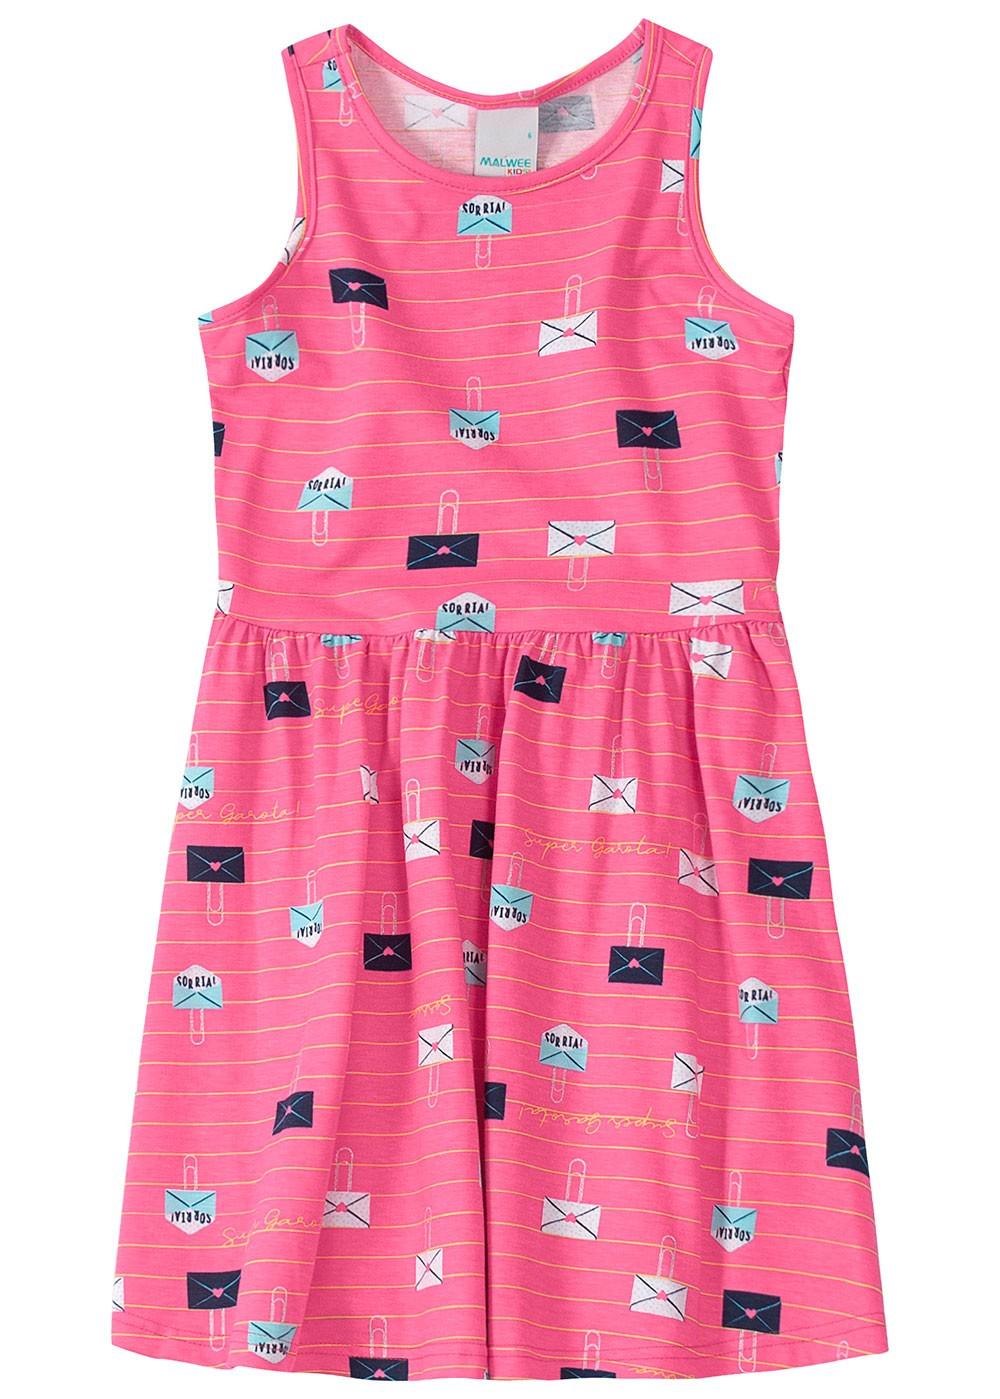 Vestido Infantil Rosa Cartinha - Malwee